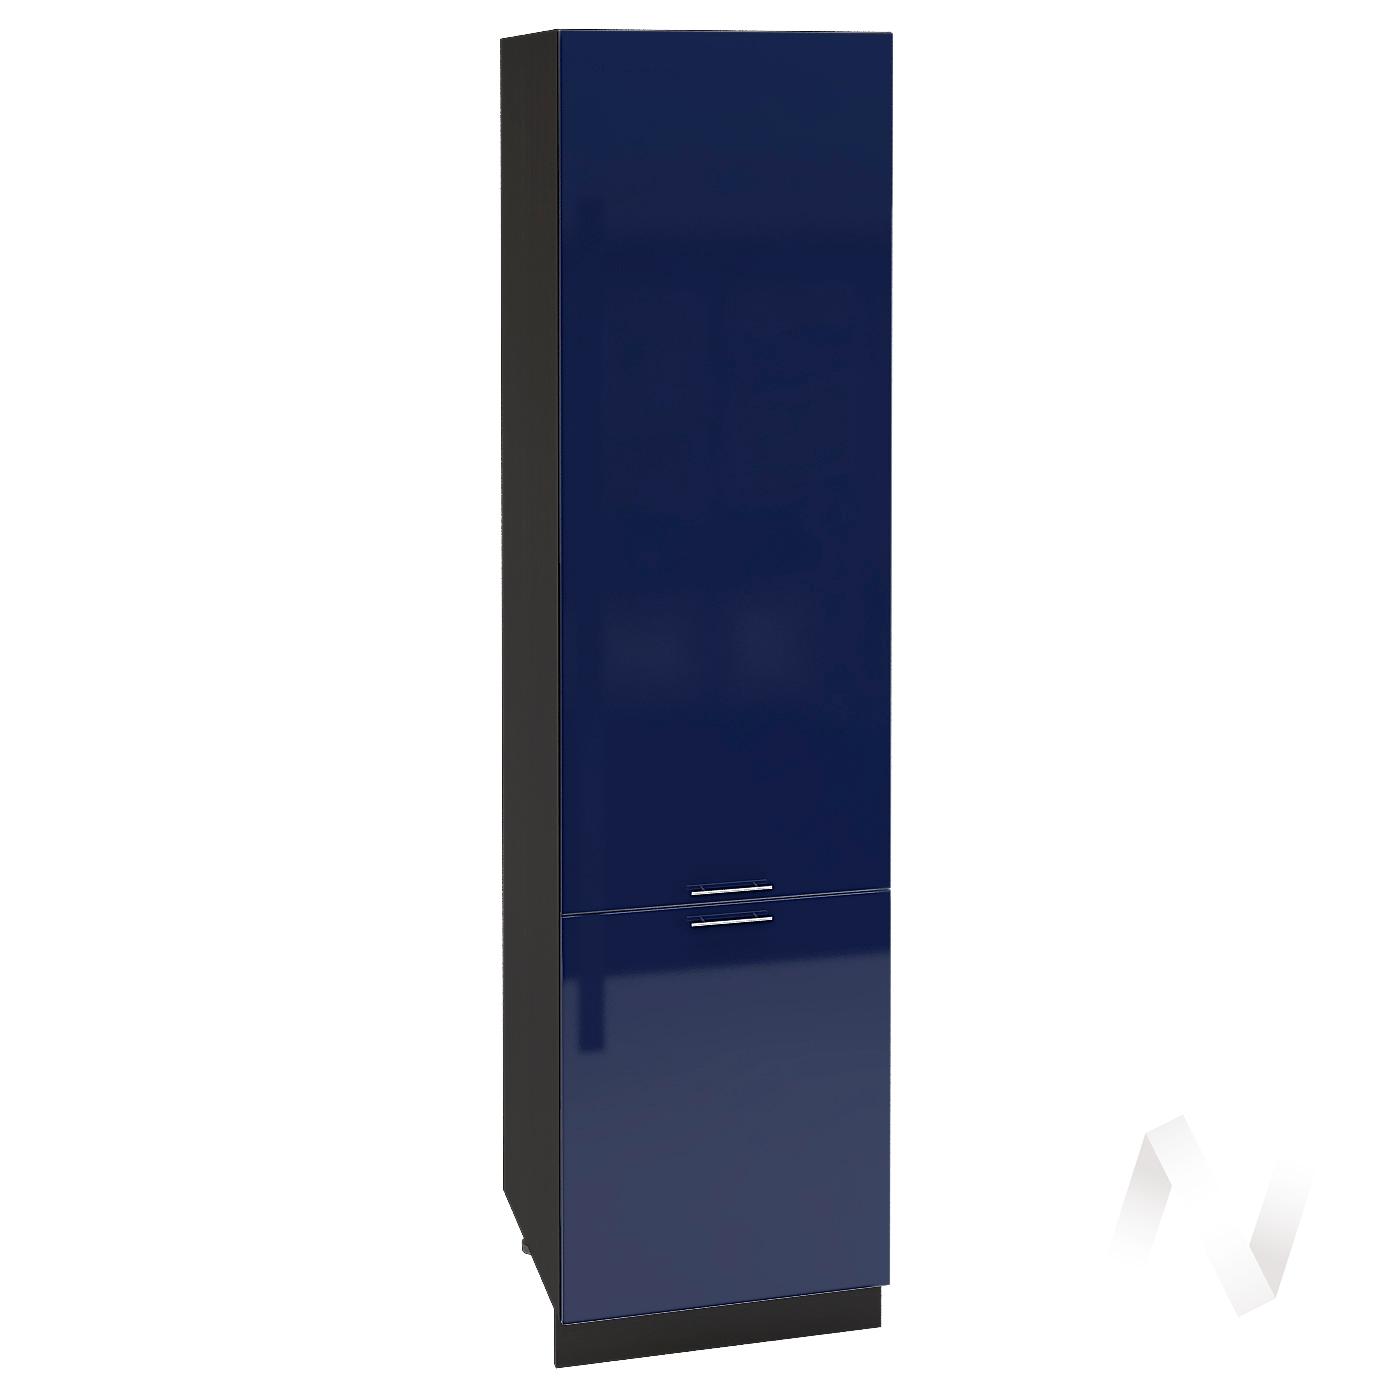 "Кухня ""Валерия-М"": Шкаф пенал 600, ШП 600НМ (Синий глянец/корпус венге)"